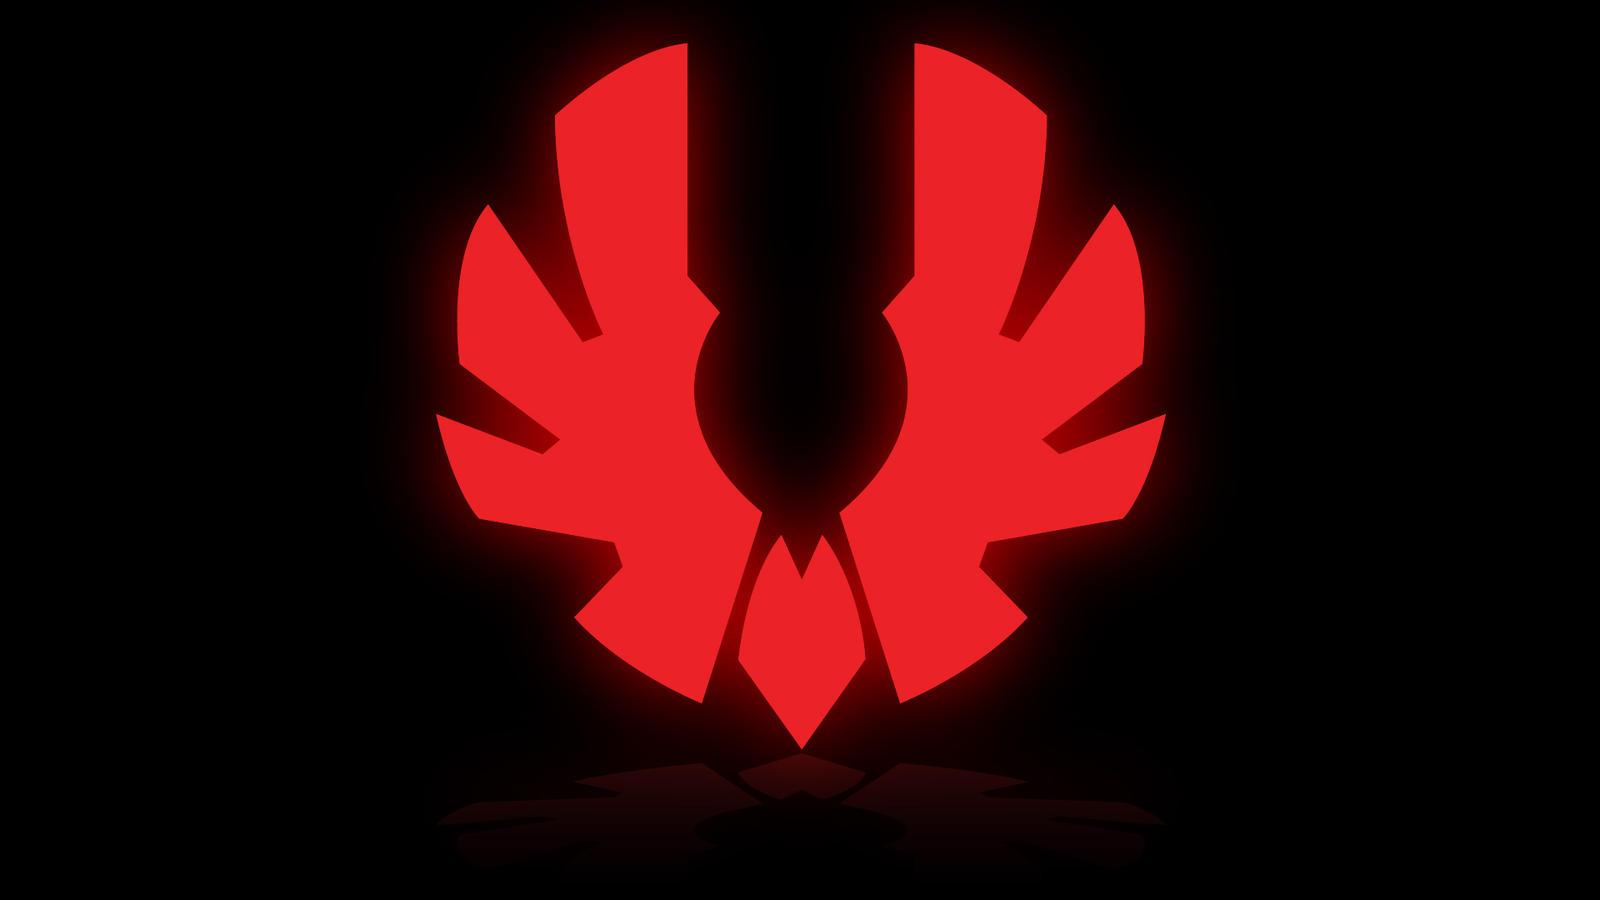 BitFenix Logo - Glow and Reflection - Black